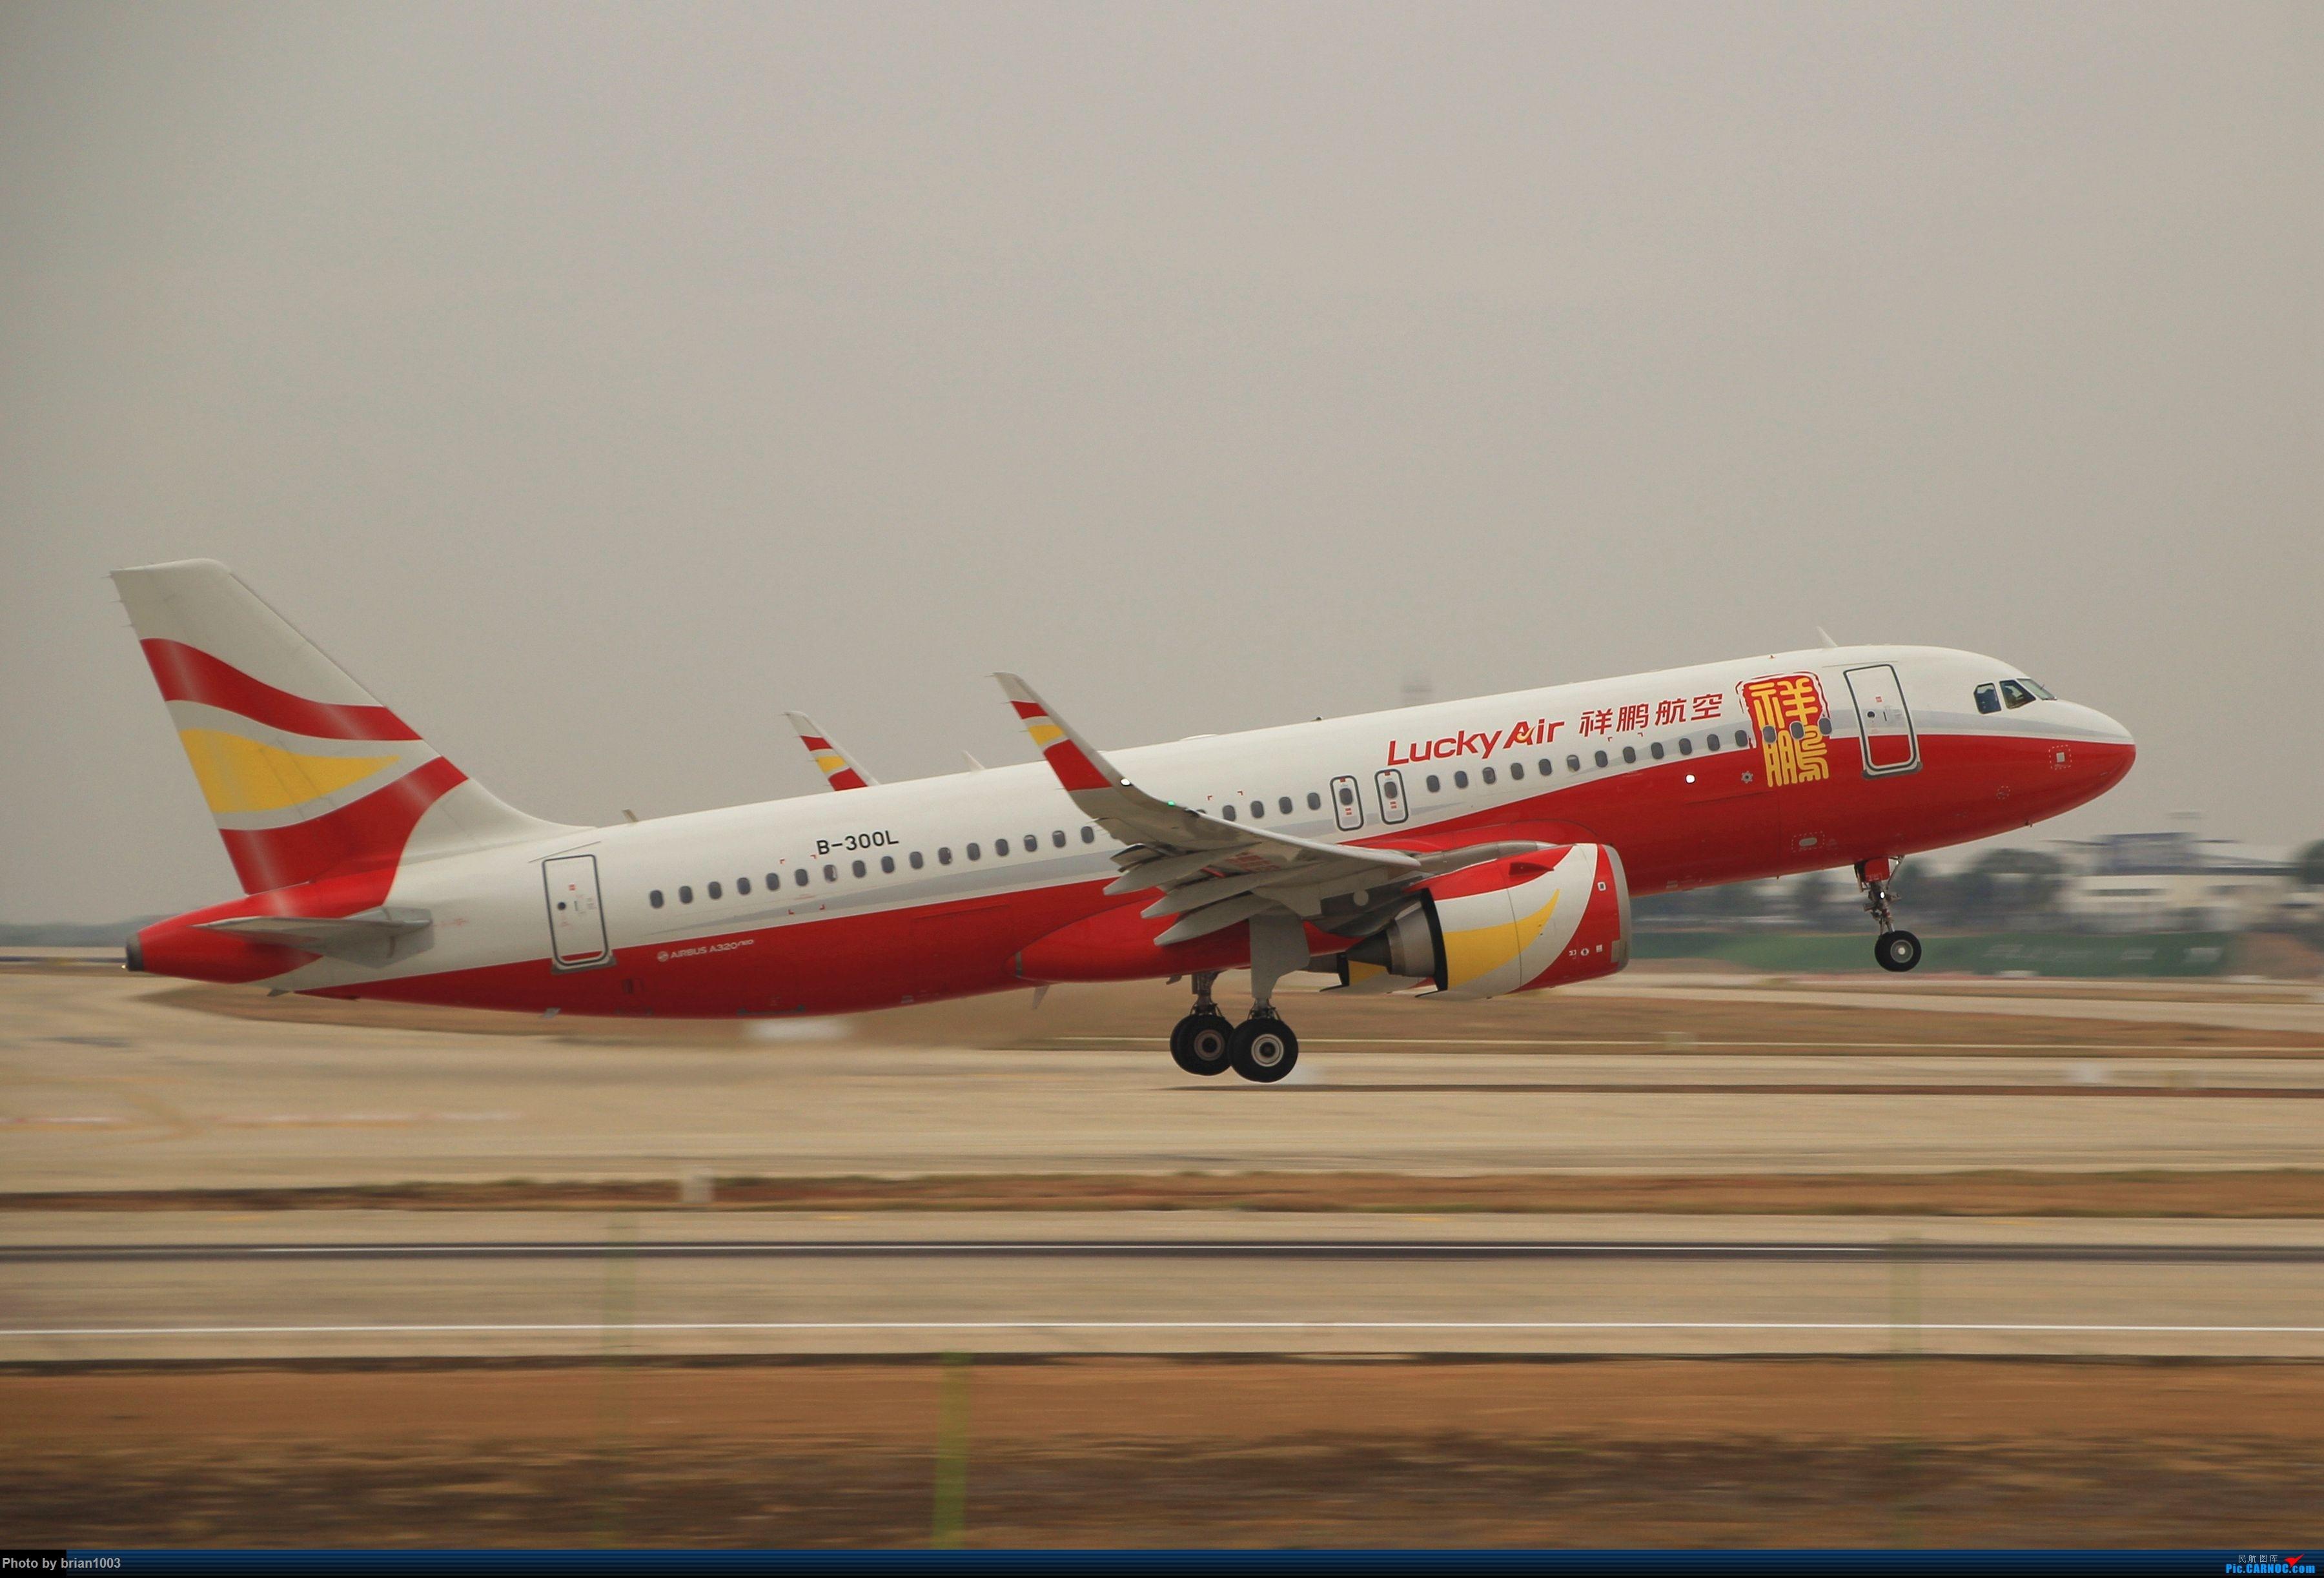 Re:[原创]WUH武汉天河机场拍机之新航季来的海航333和幸福的738 AIRBUS A320NEO B-300L 中国武汉天河国际机场